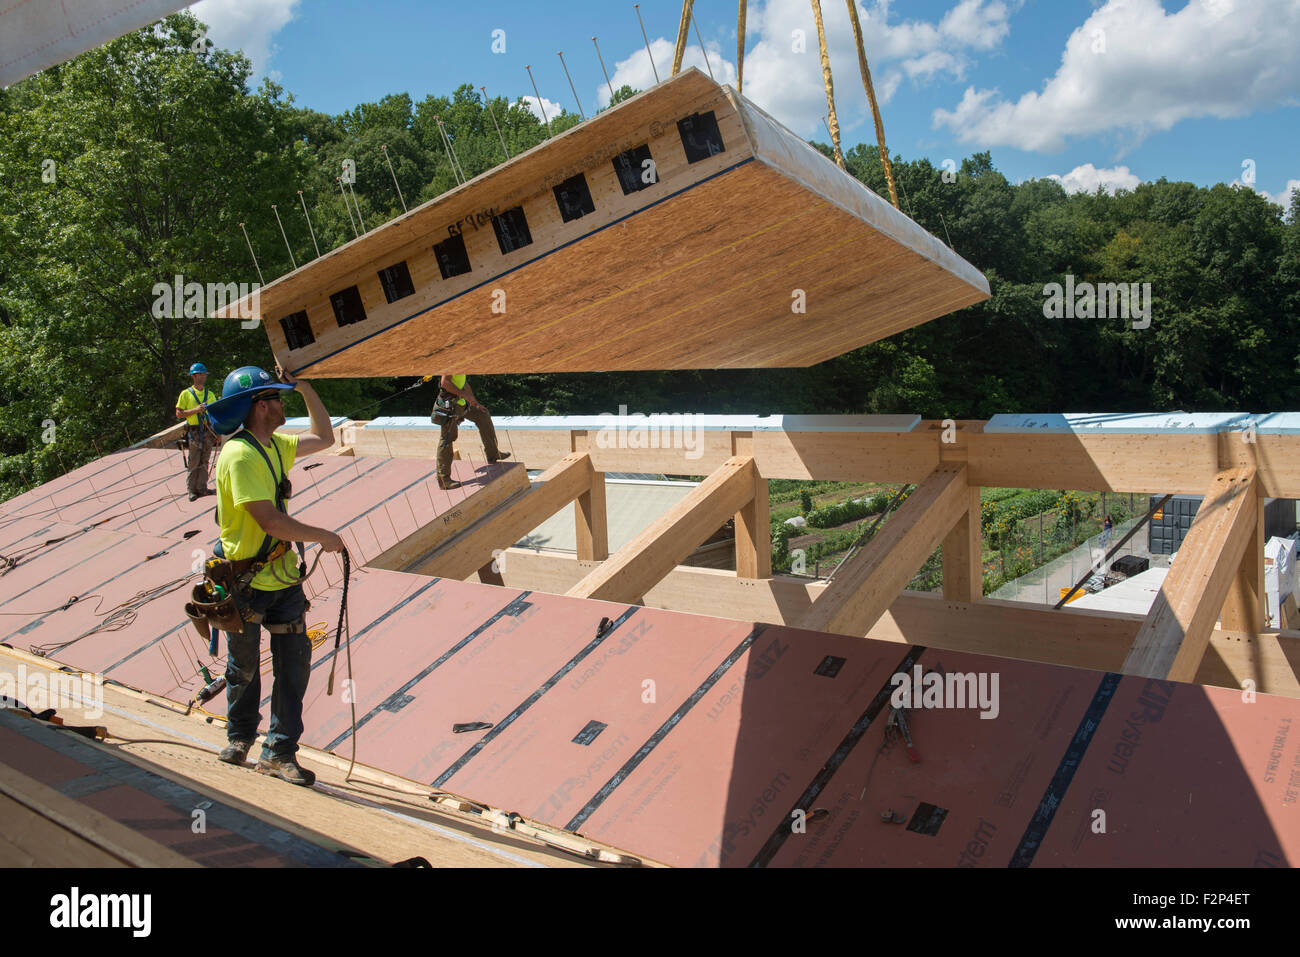 Bauarbeiter installieren Dachplatten auf Leed Platin Common Ground High School Gebäude. Stockbild